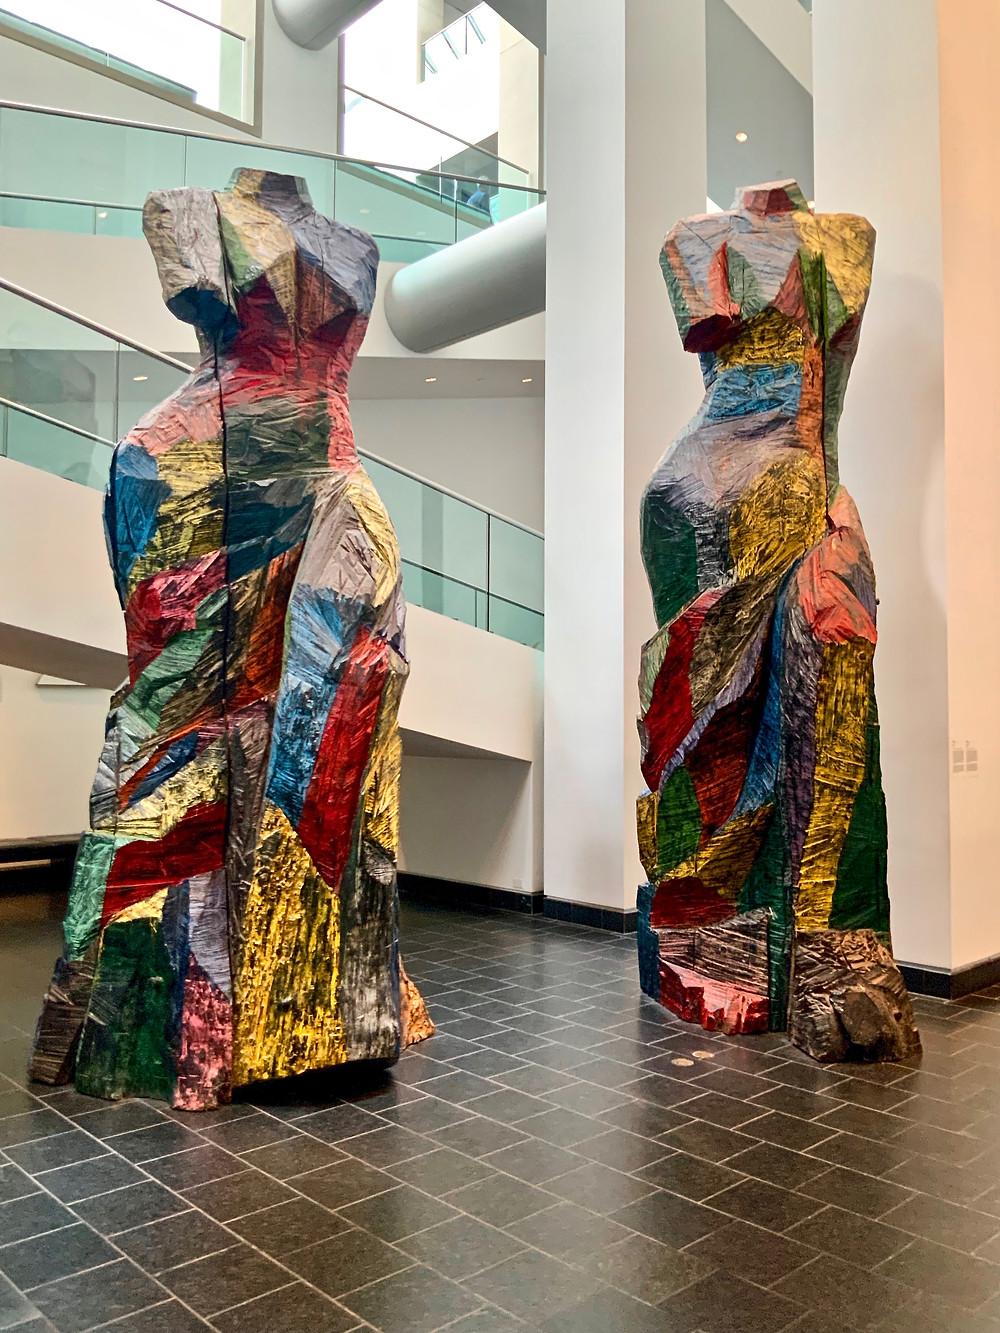 Jim Dine, At the Carnival, 1996  -- Dine's modern take on the Louvre's Venus de Milo